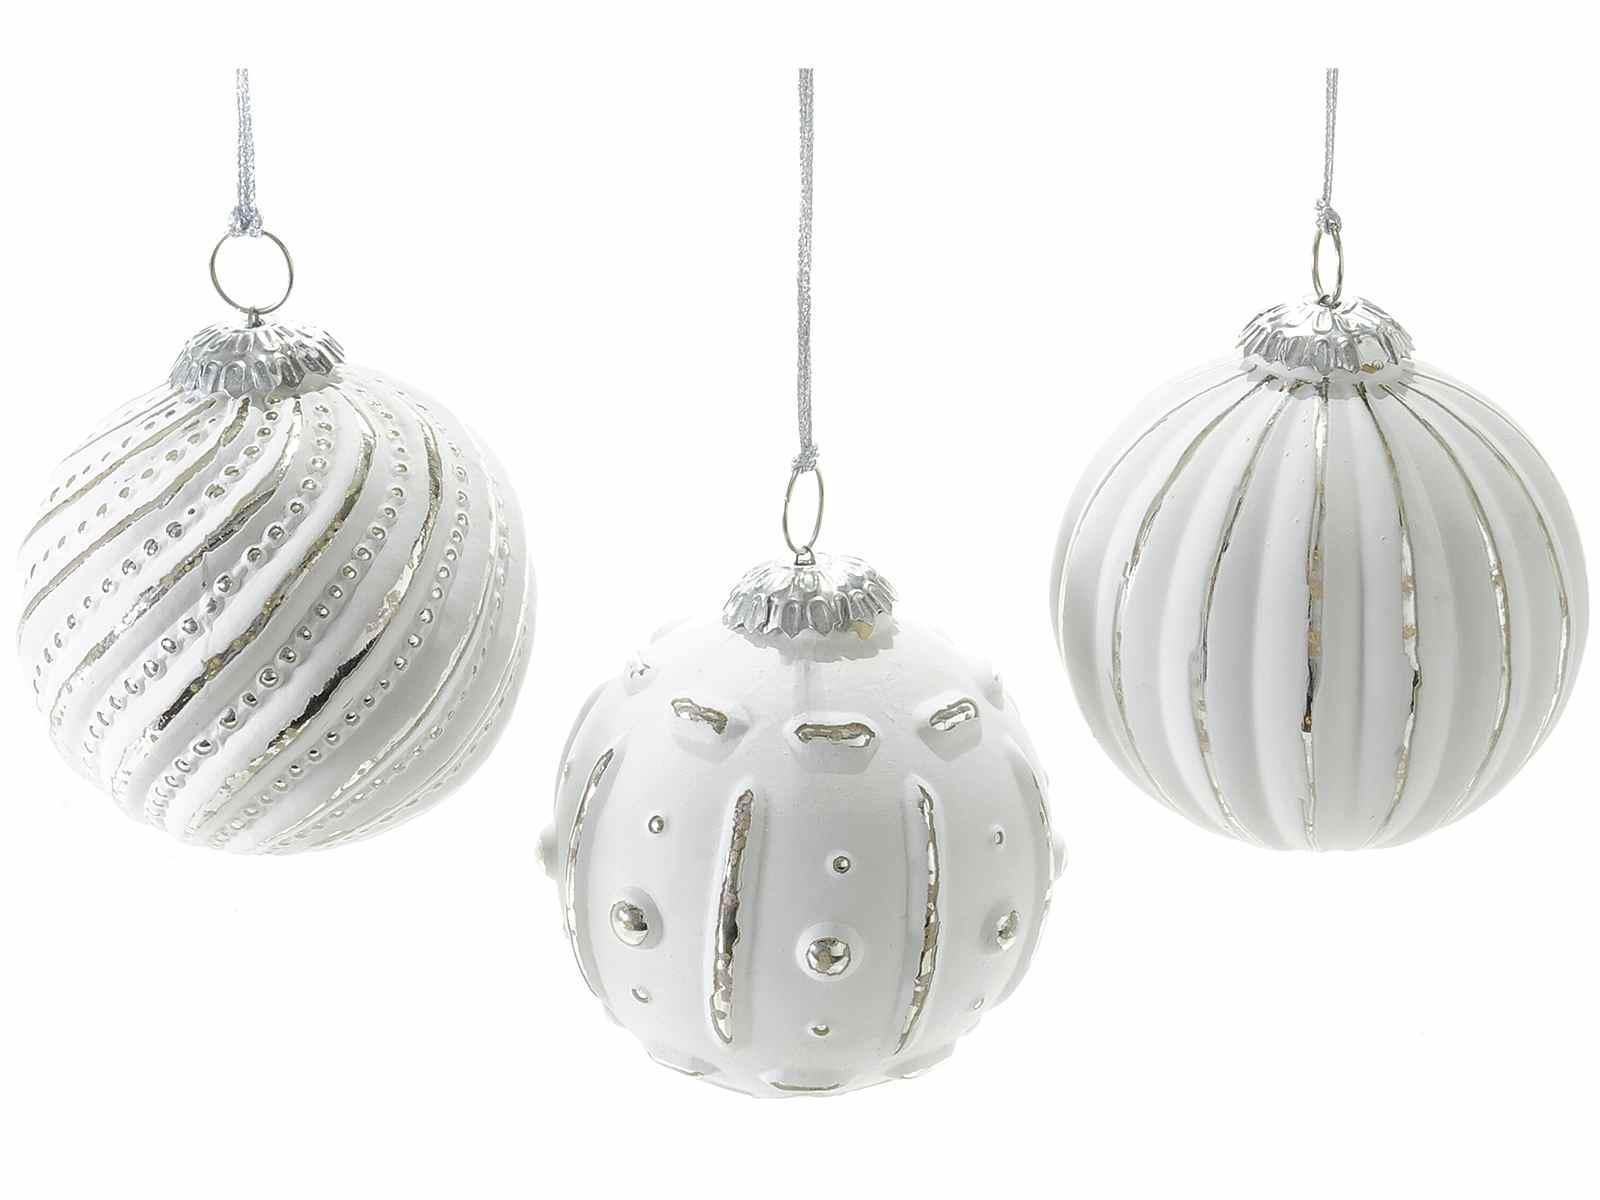 boule de noel suspendre en verre blanc et argent art from italy. Black Bedroom Furniture Sets. Home Design Ideas